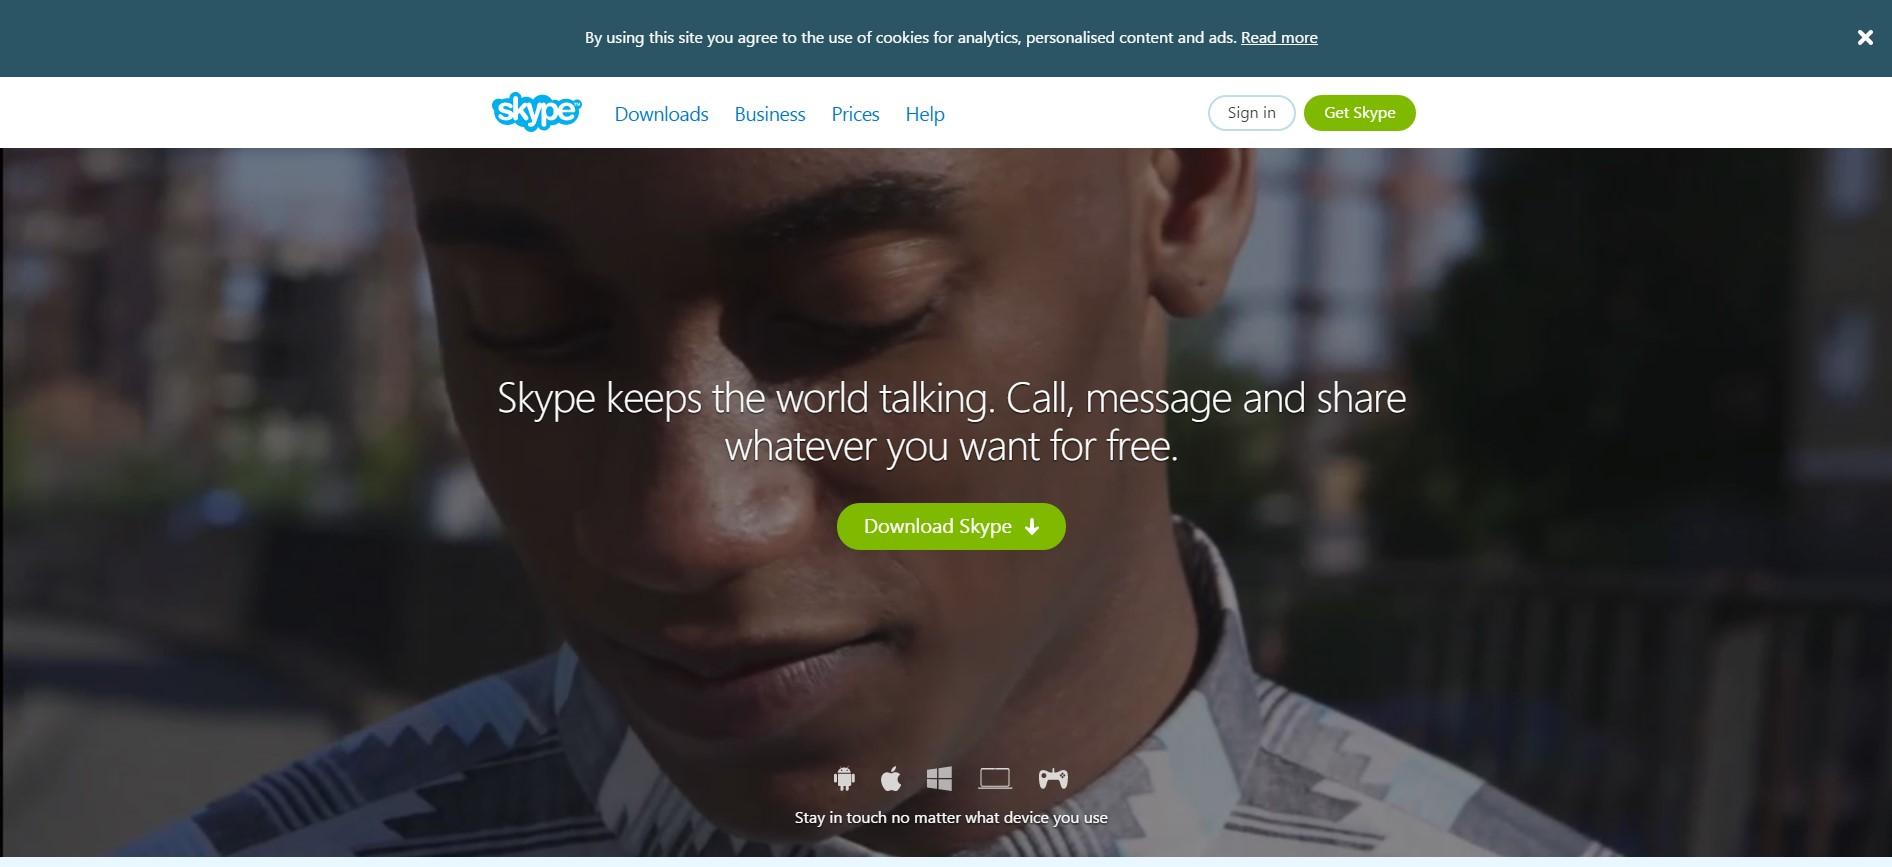 skype.bmp